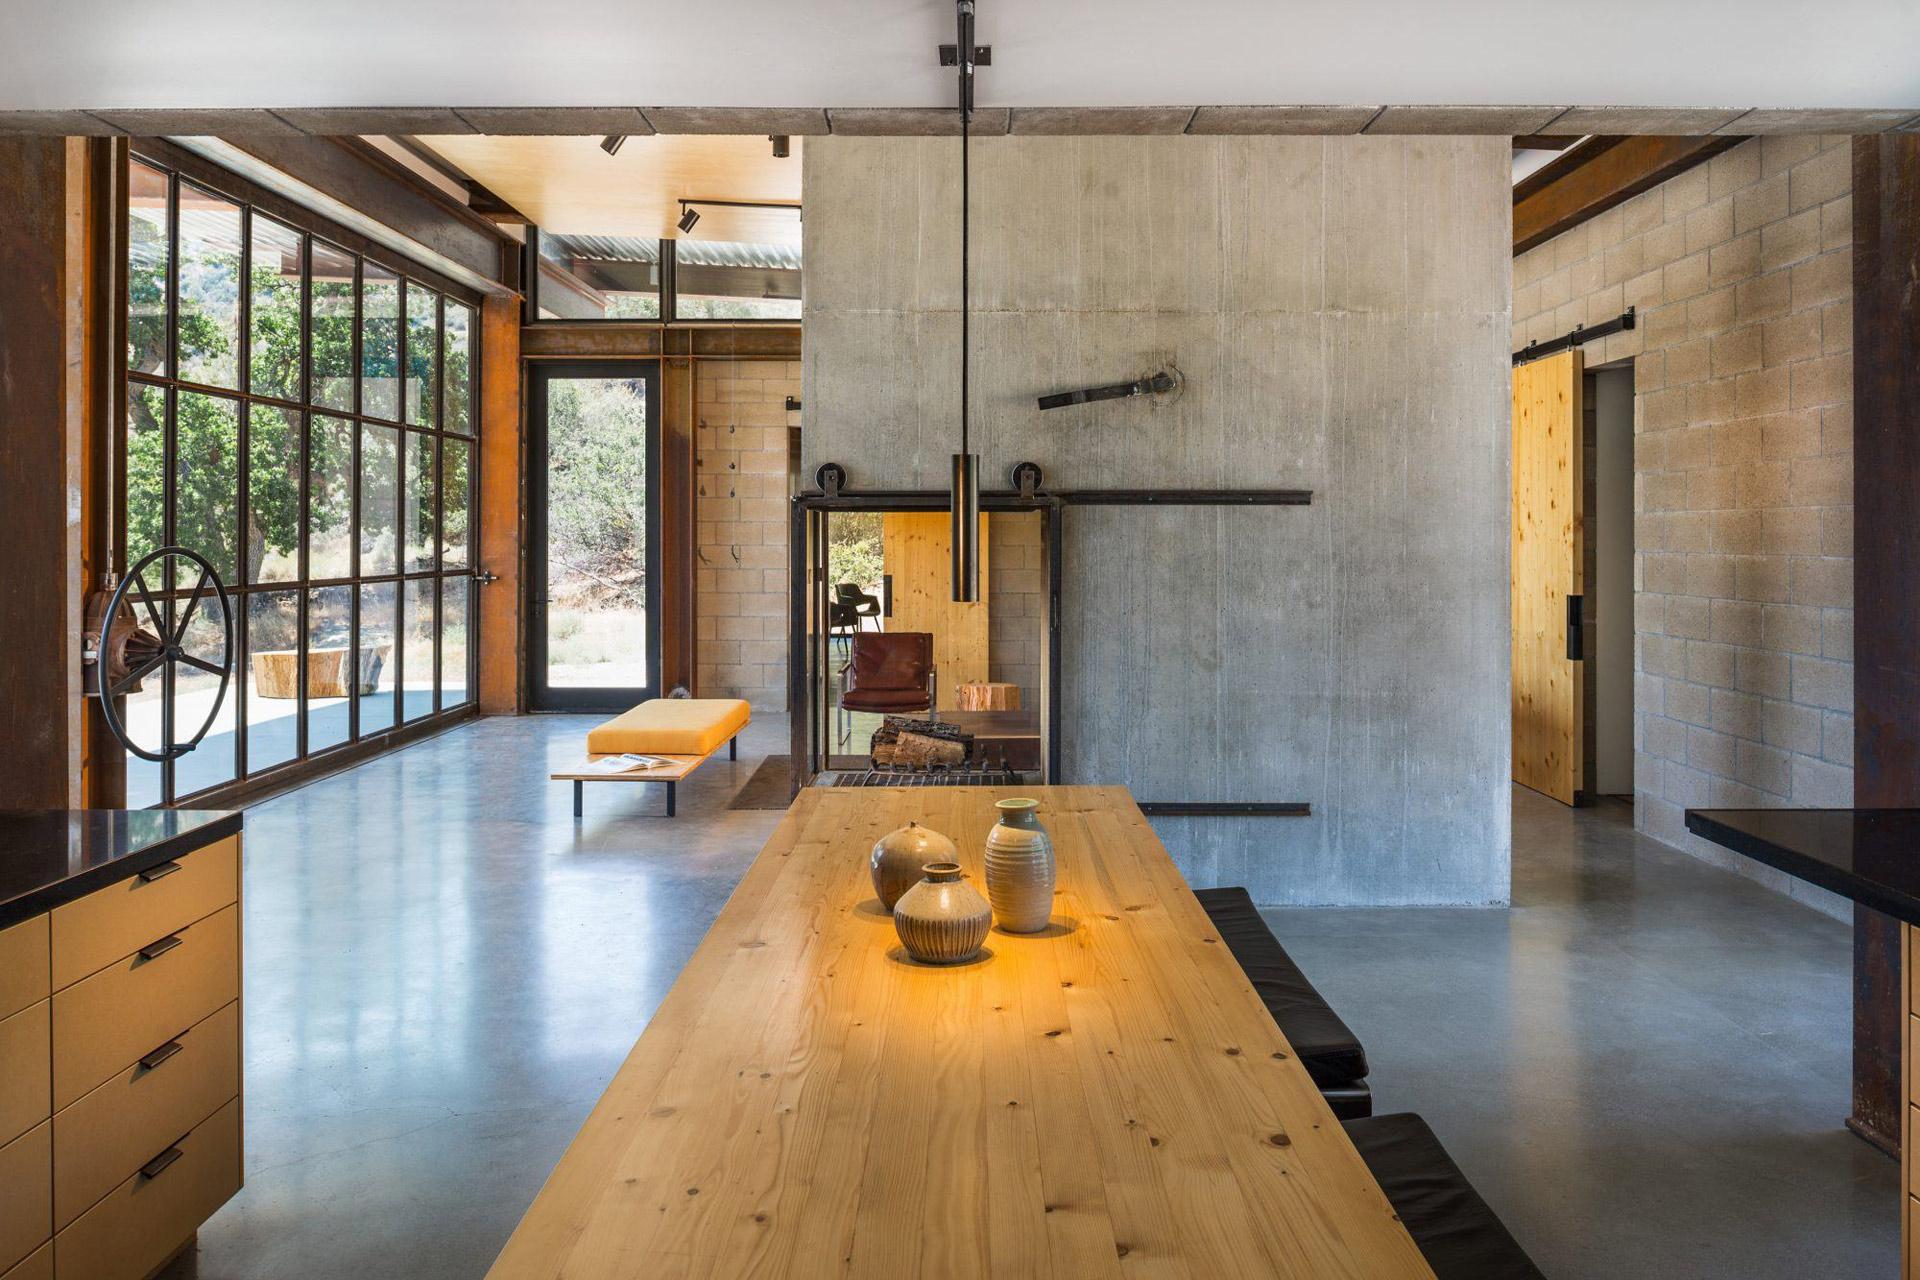 tehachapi-sawmill-house-4.jpg